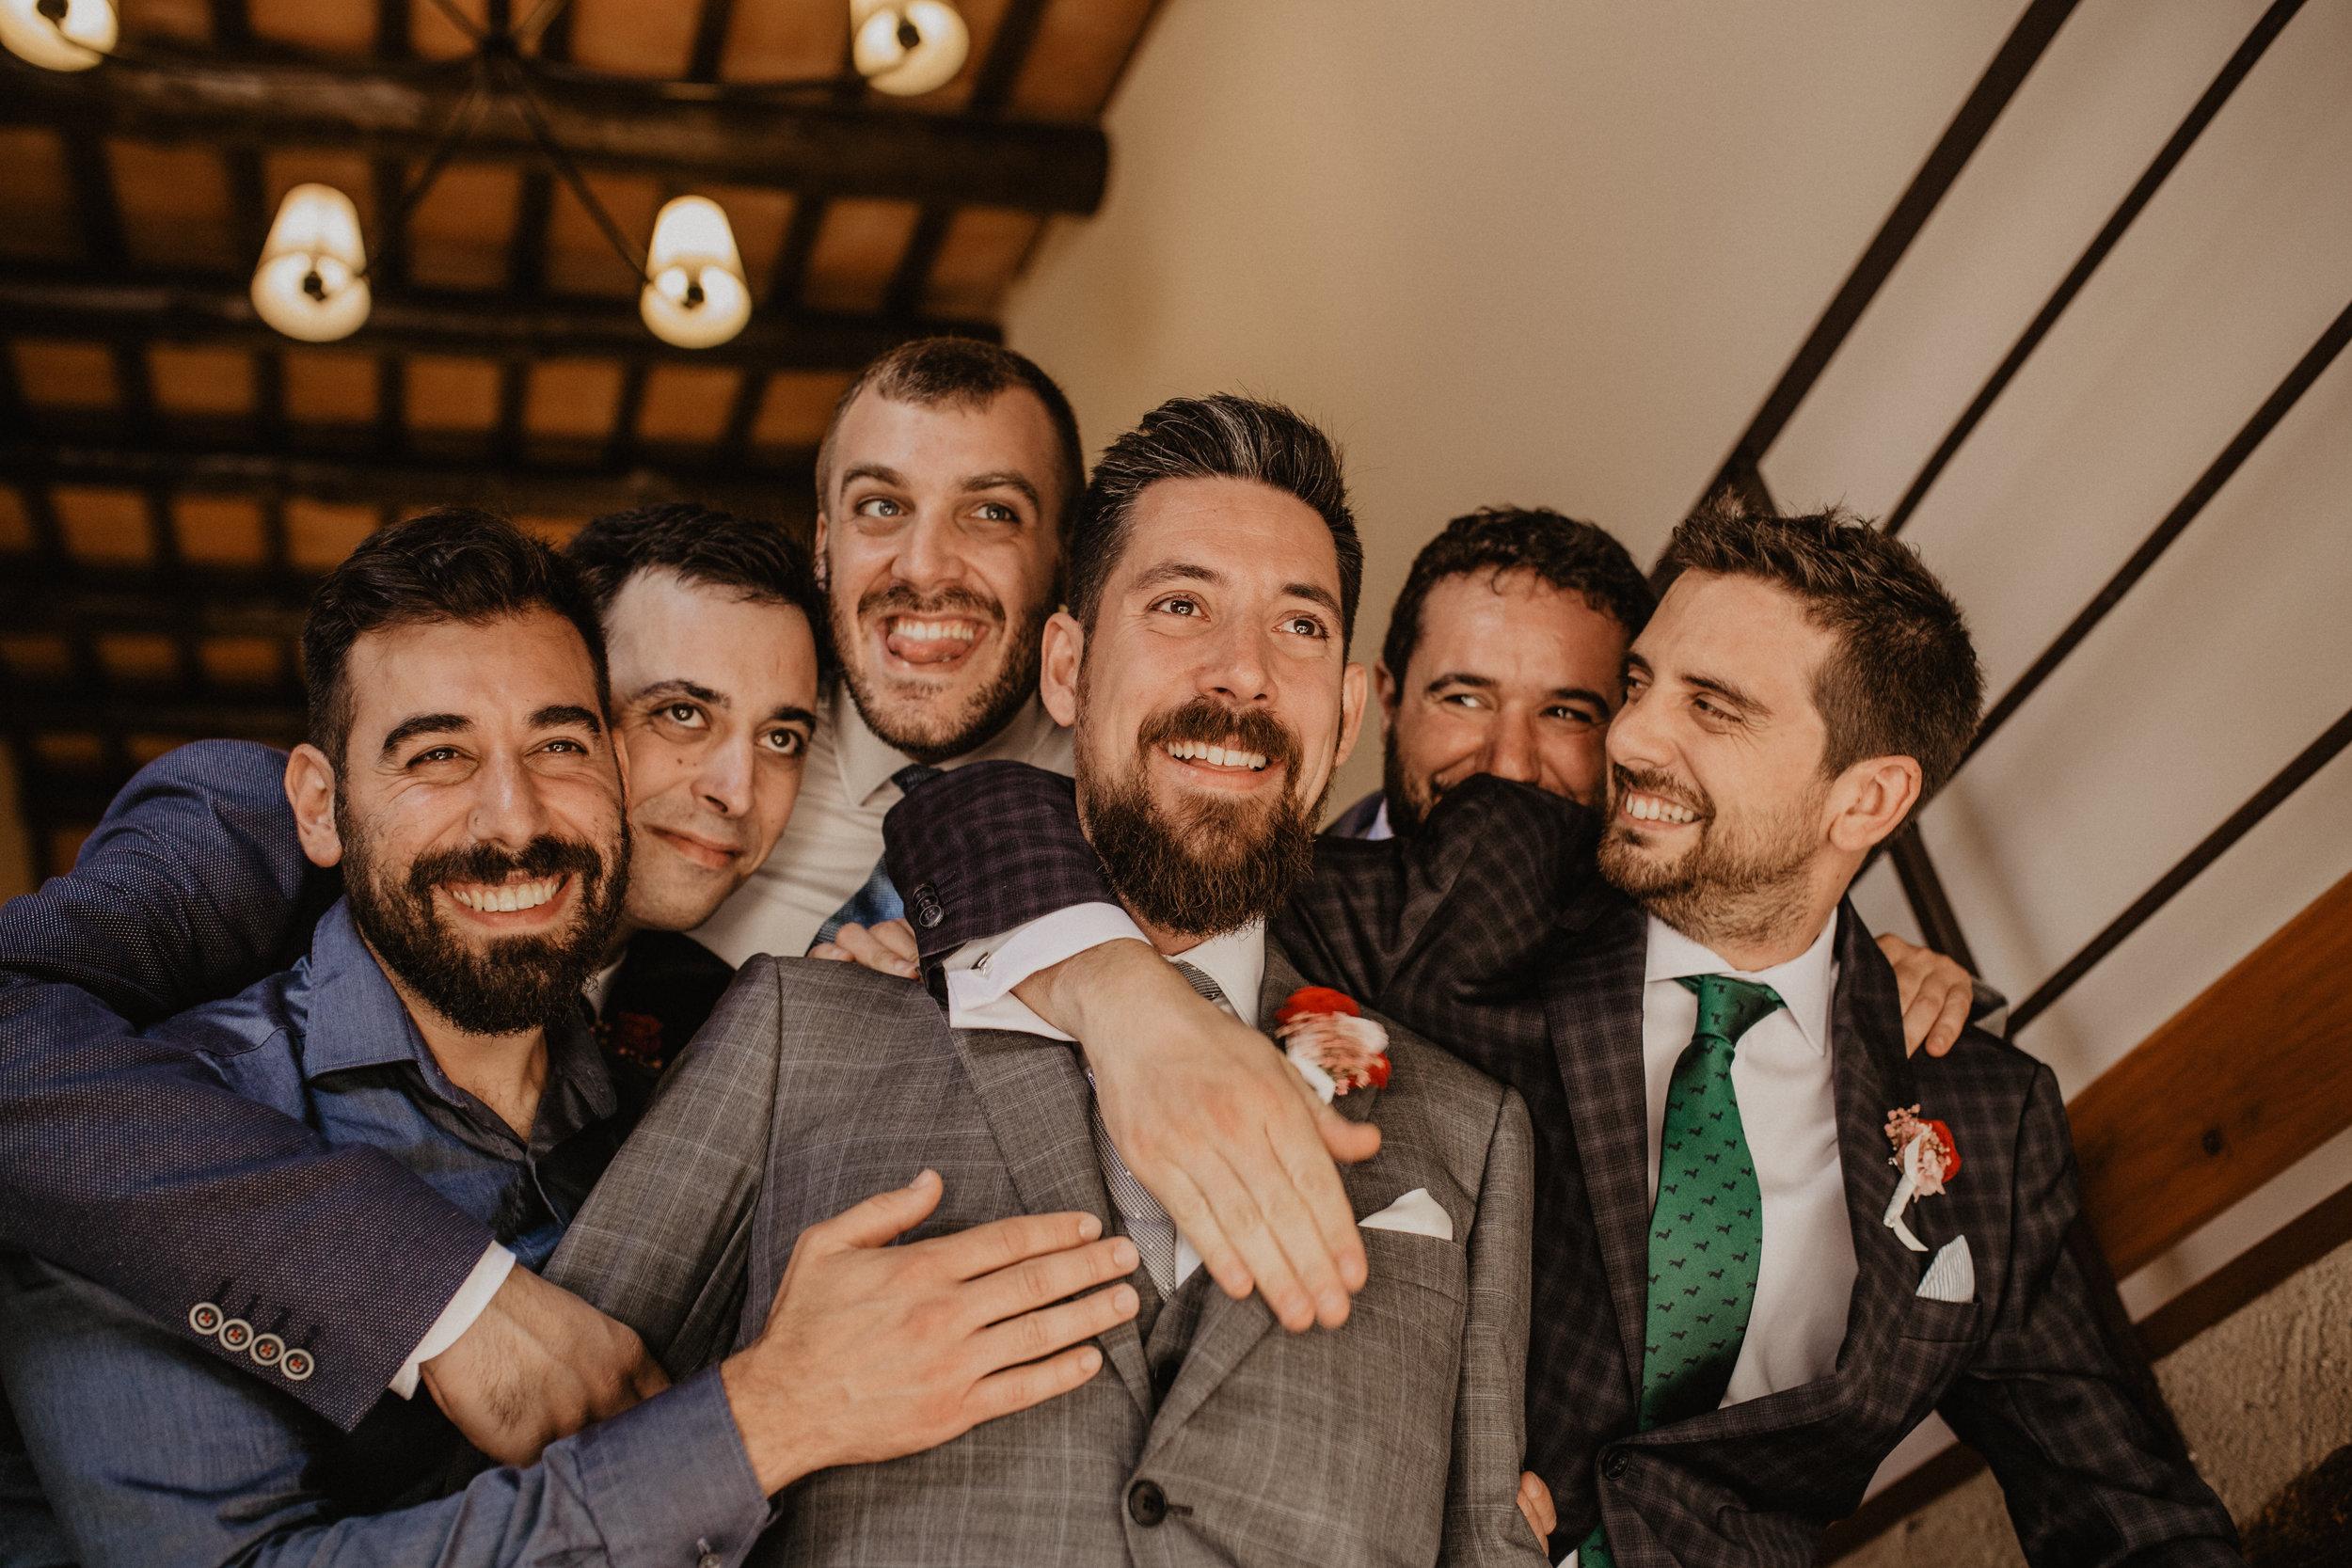 thenortherngirlphotography_photography_thenortherngirl_rebeccascabros_wedding_weddingphotography_masialagarrigadecastelladral_joaniemma_bodaenbarcelona_weddingphotographer_emmaijoan-229.jpg